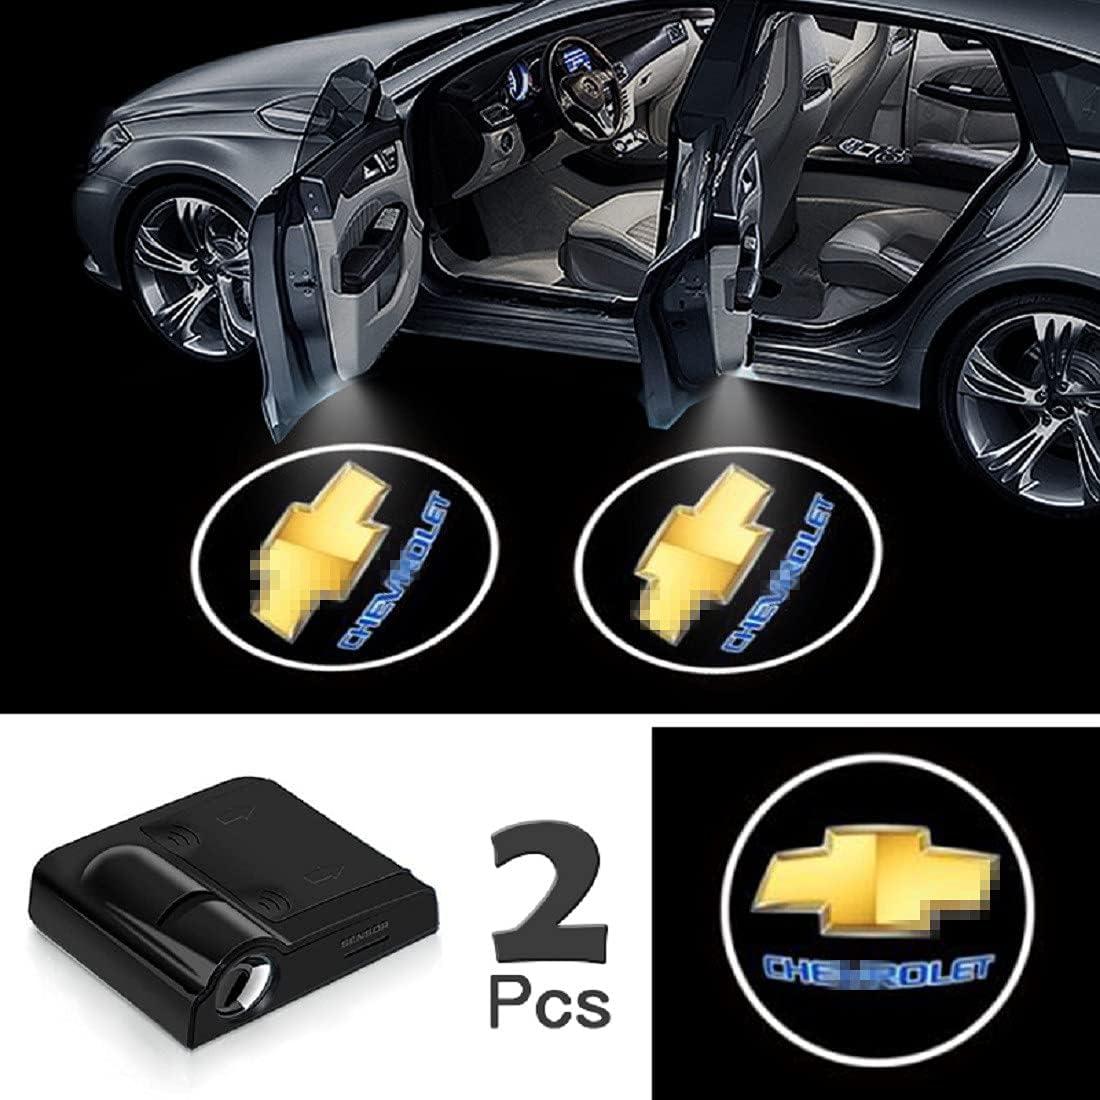 Universal Wireless Car Door Led Projector Lights FOR KIA BLUE 2Pcs of Car Door Lights Logo Projector Upgraded Car Door Welcome Logo Projector Lights for All Car Models